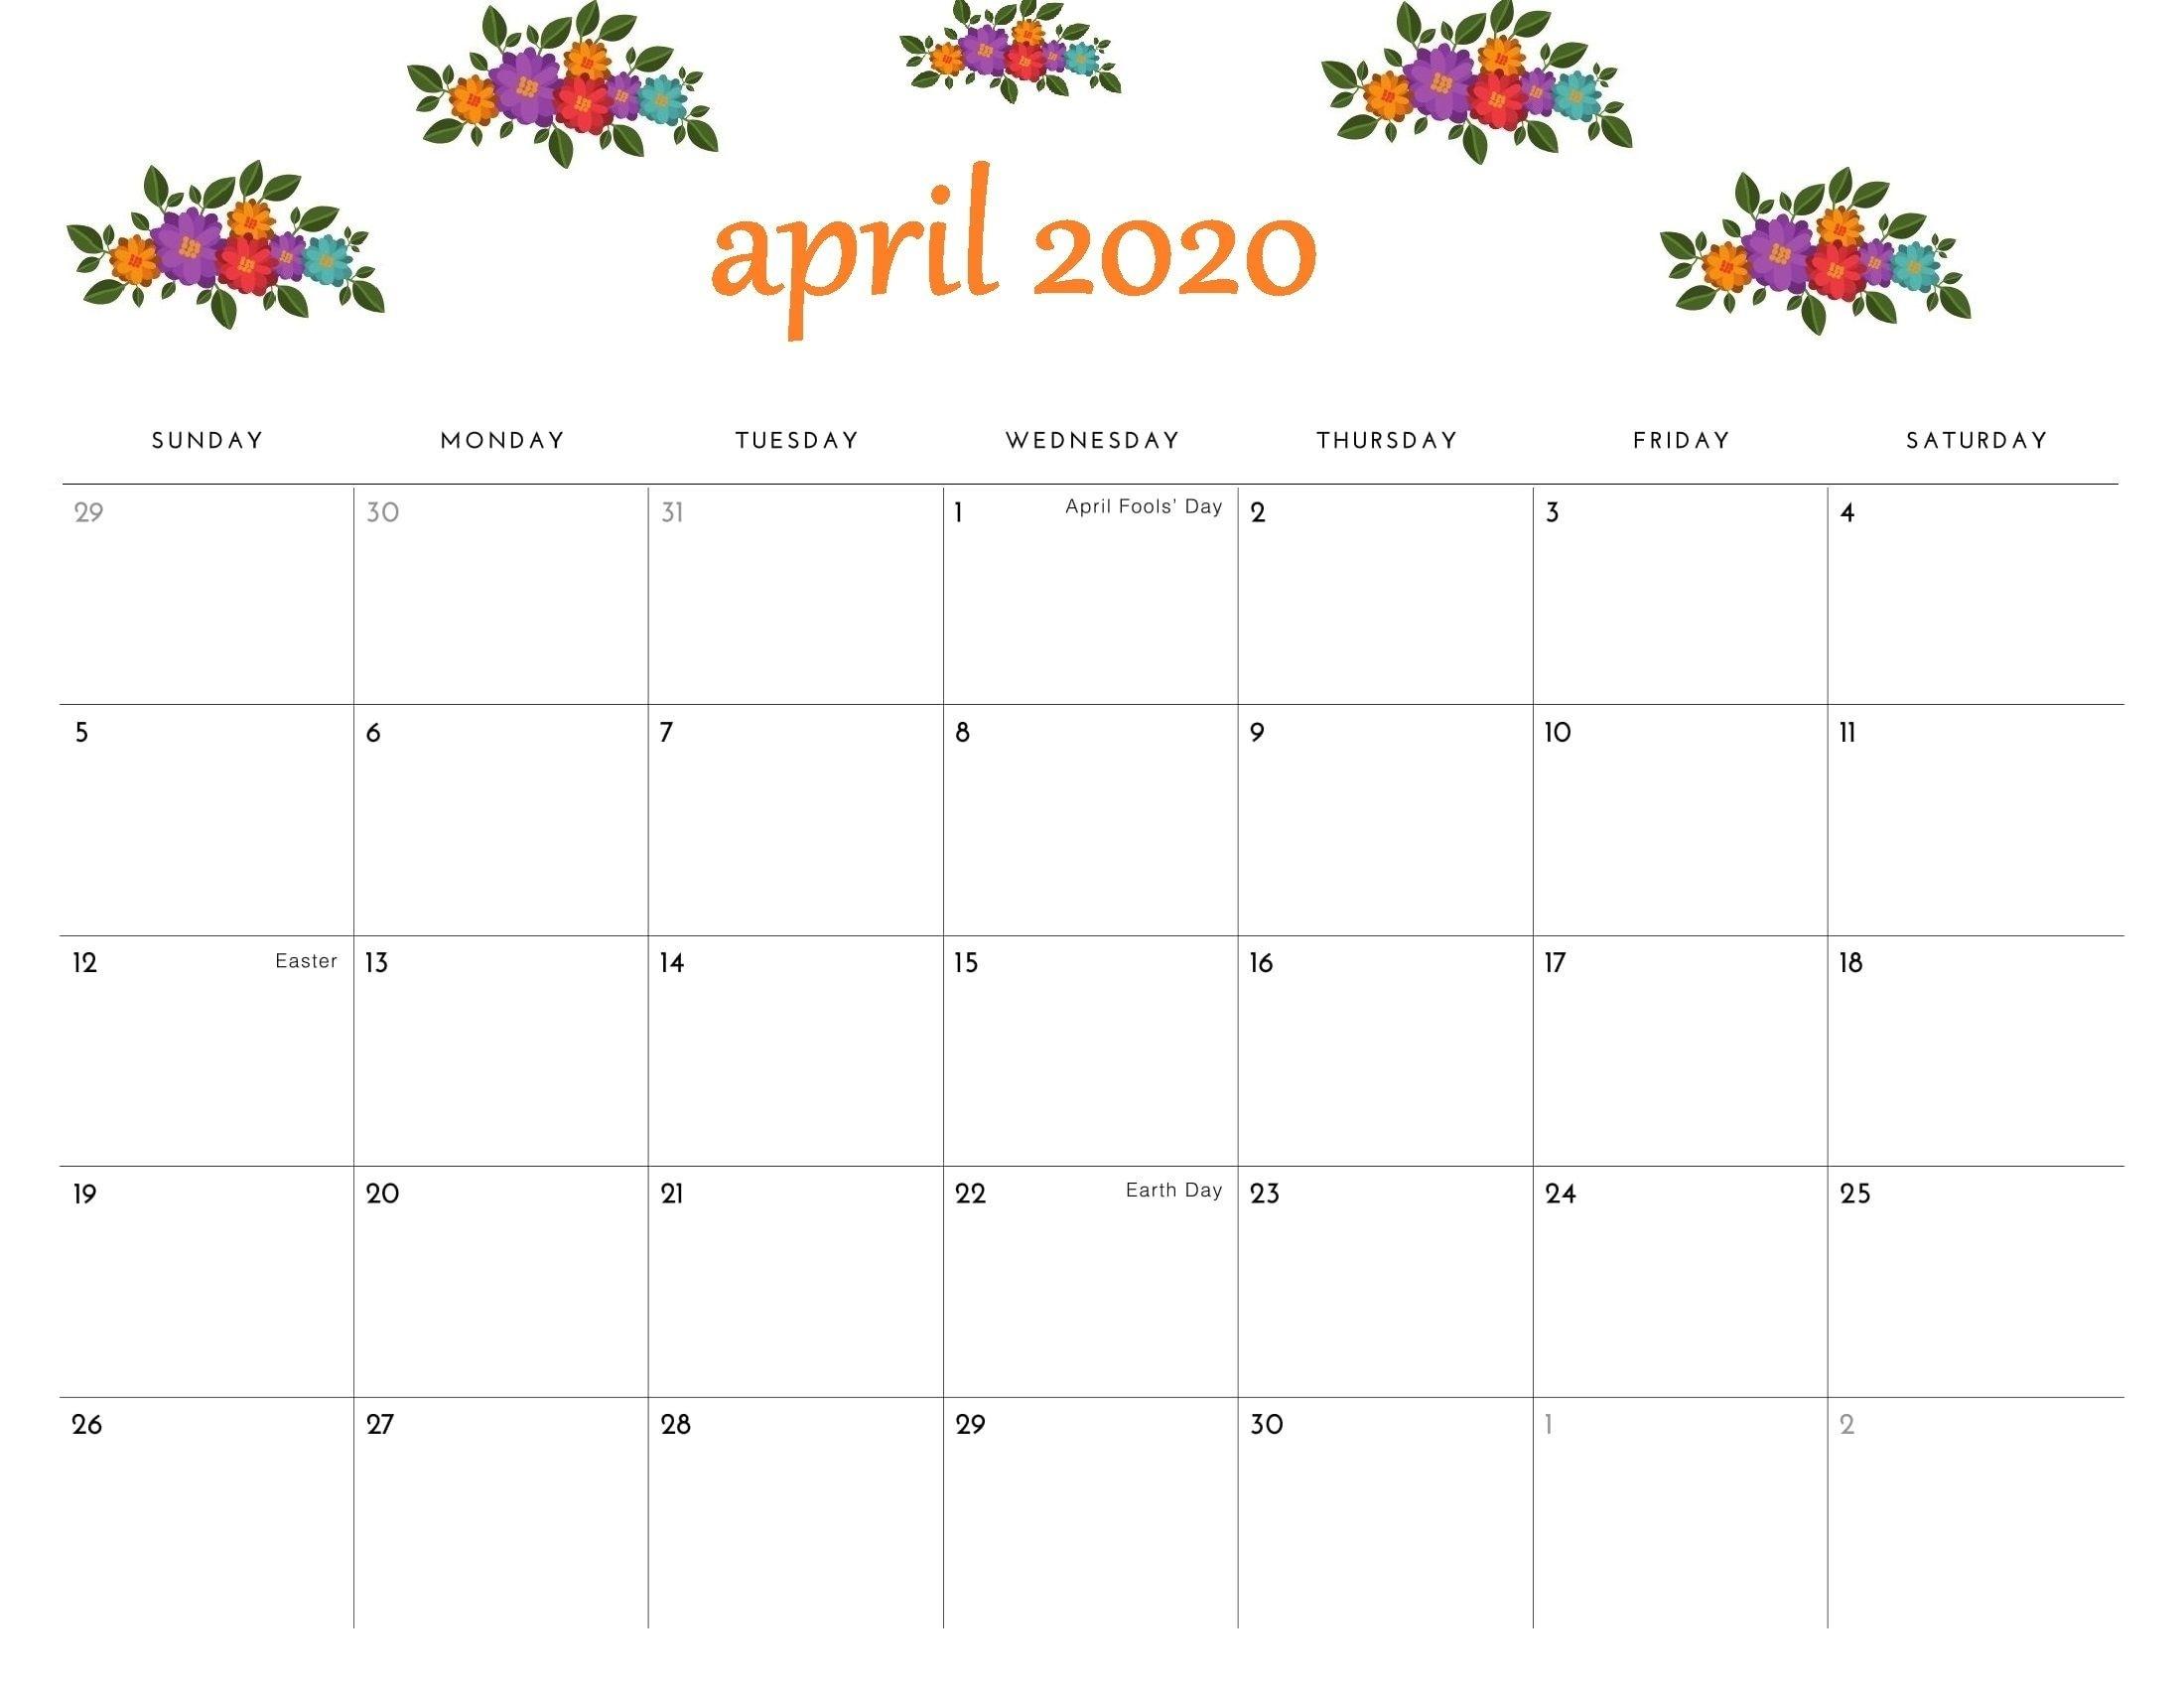 April 2020 Printable Calendar Floral Template In 2020 inside Large Box Calendar 2020 Printable